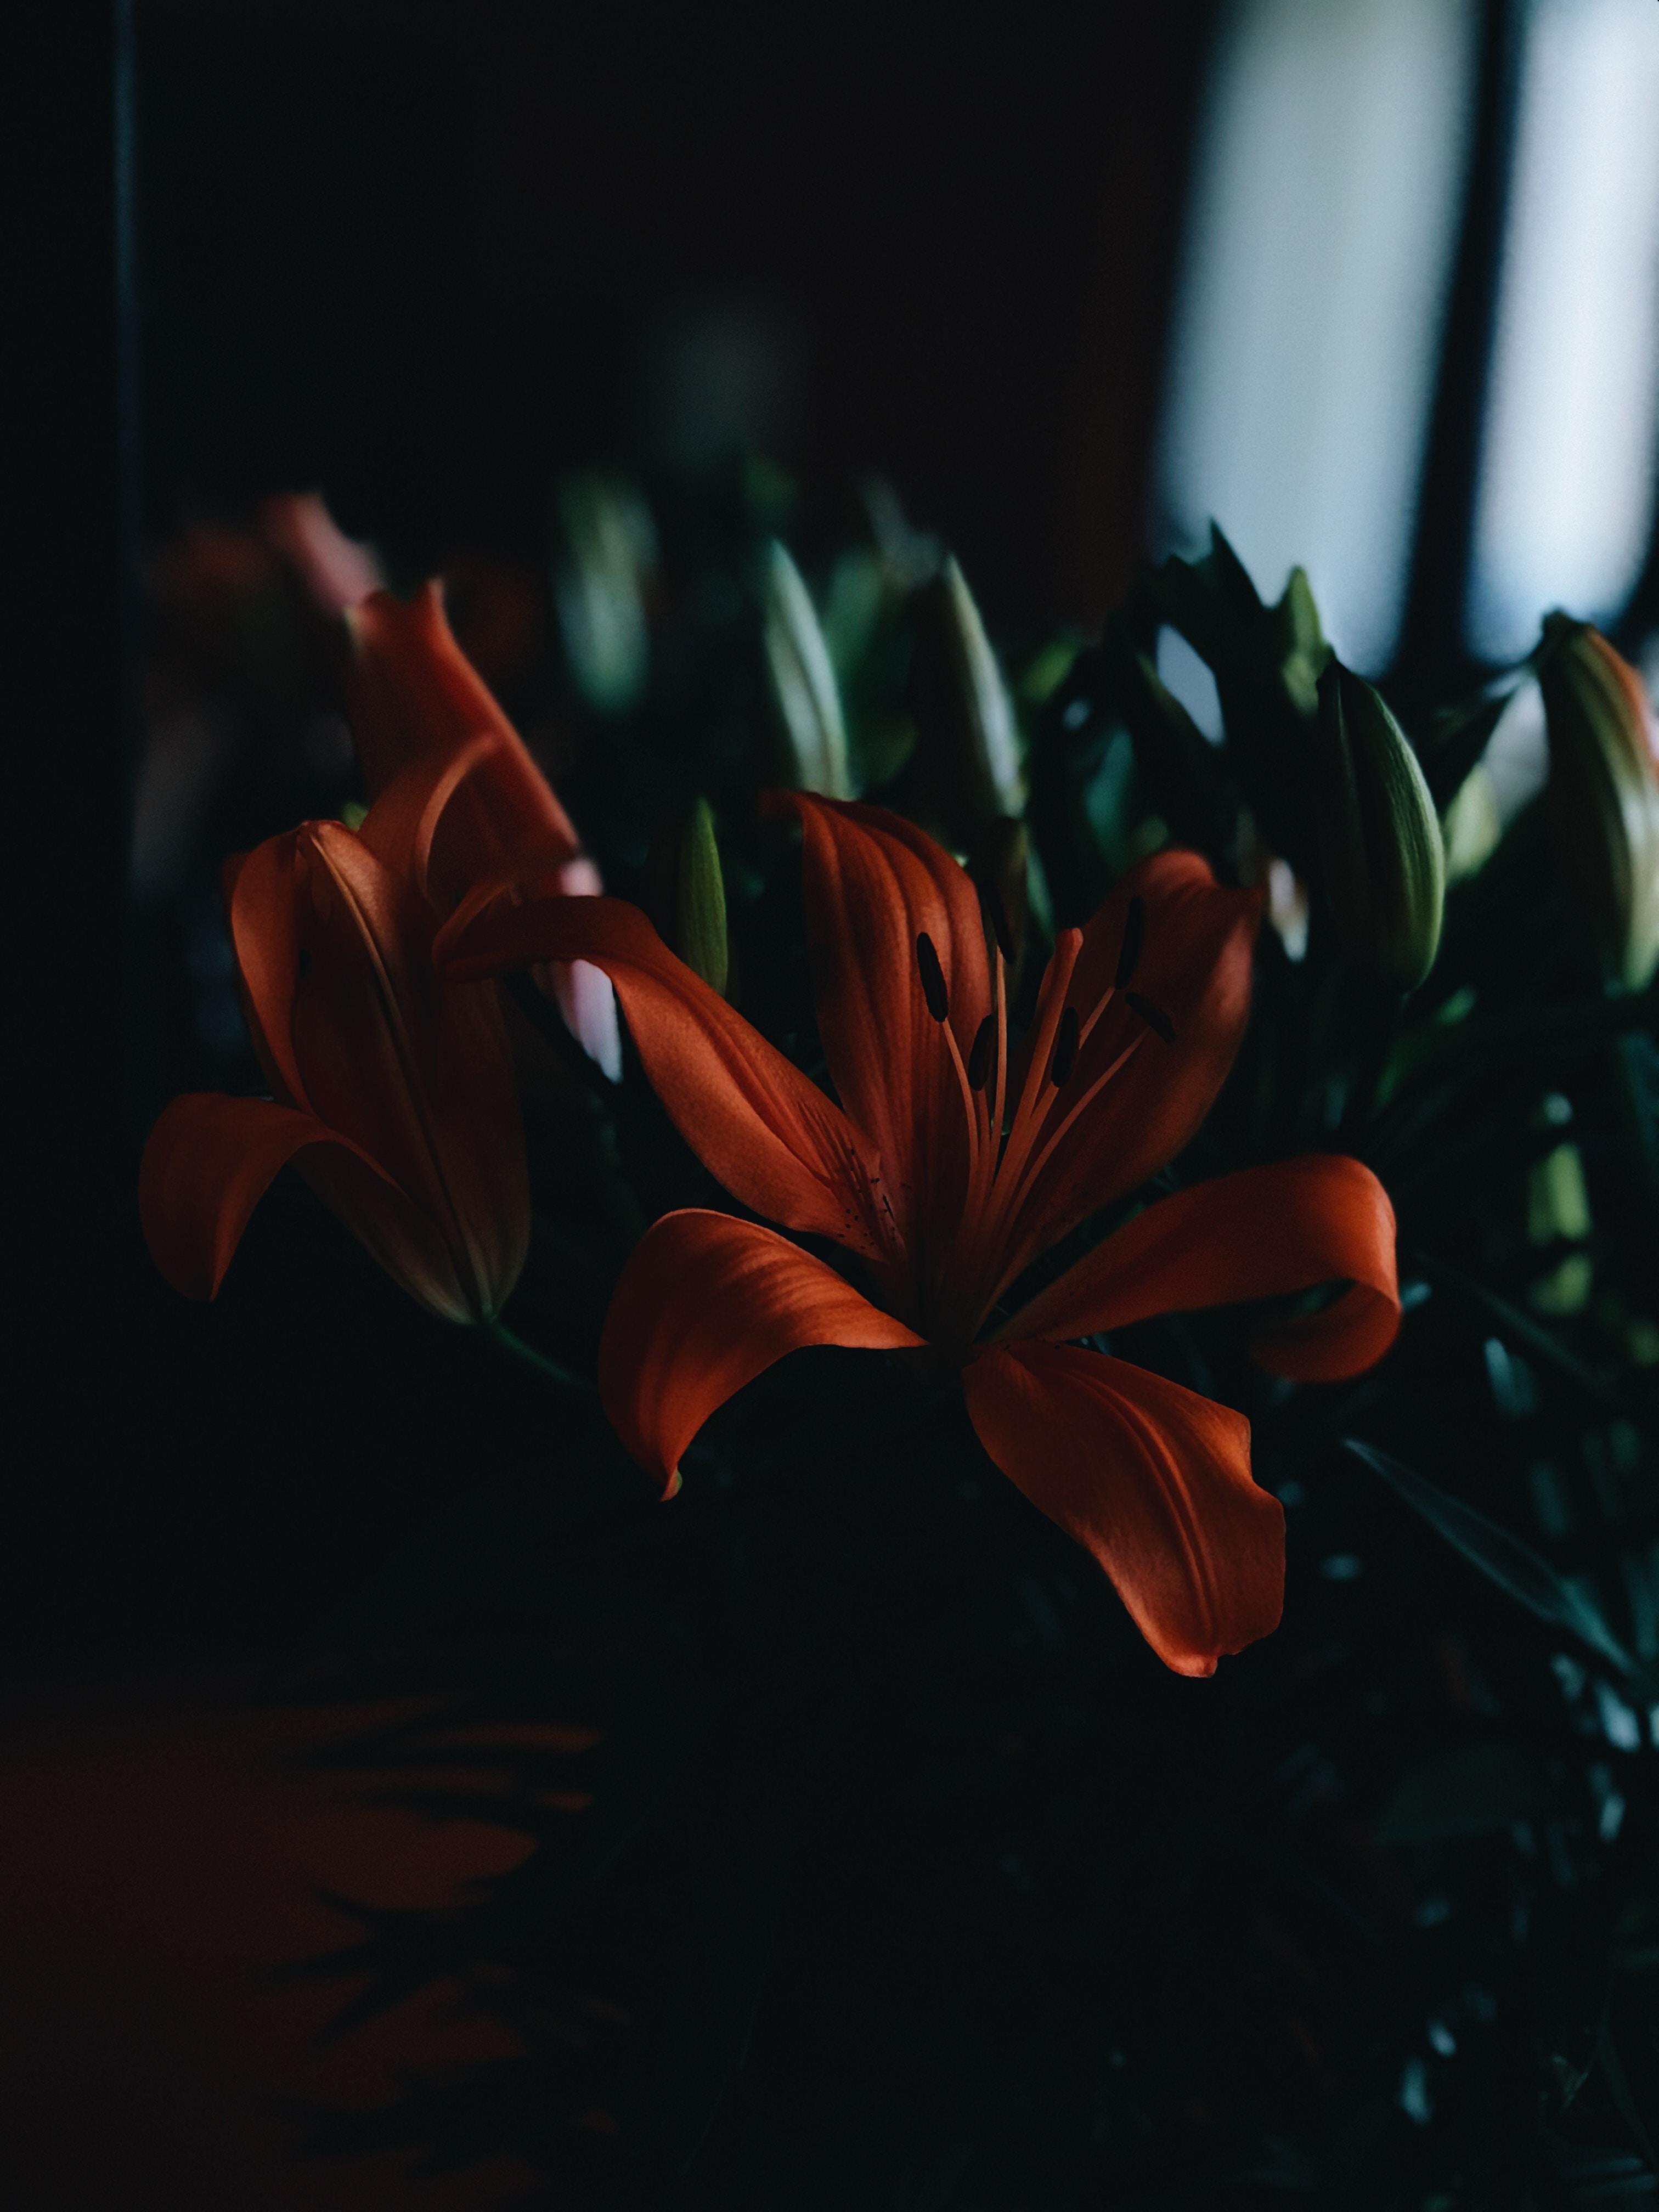 tilt shift lens photography of red flower with green leaf